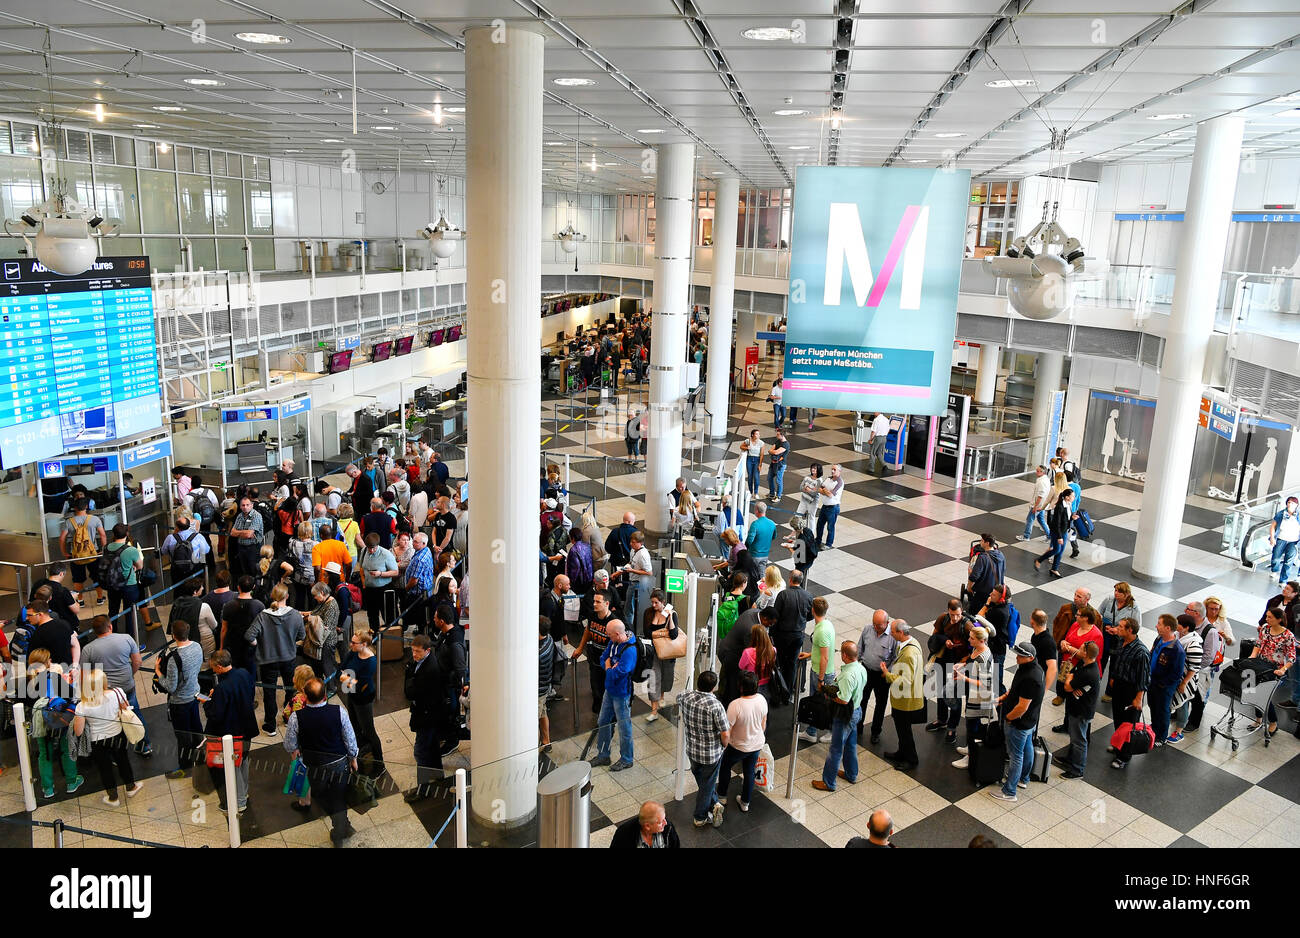 Terminal 1, Modul C, departure, Security Controls, Check Point, People, Passenger, Pace, Pax, MUC, EDDM, Airport - Stock Image